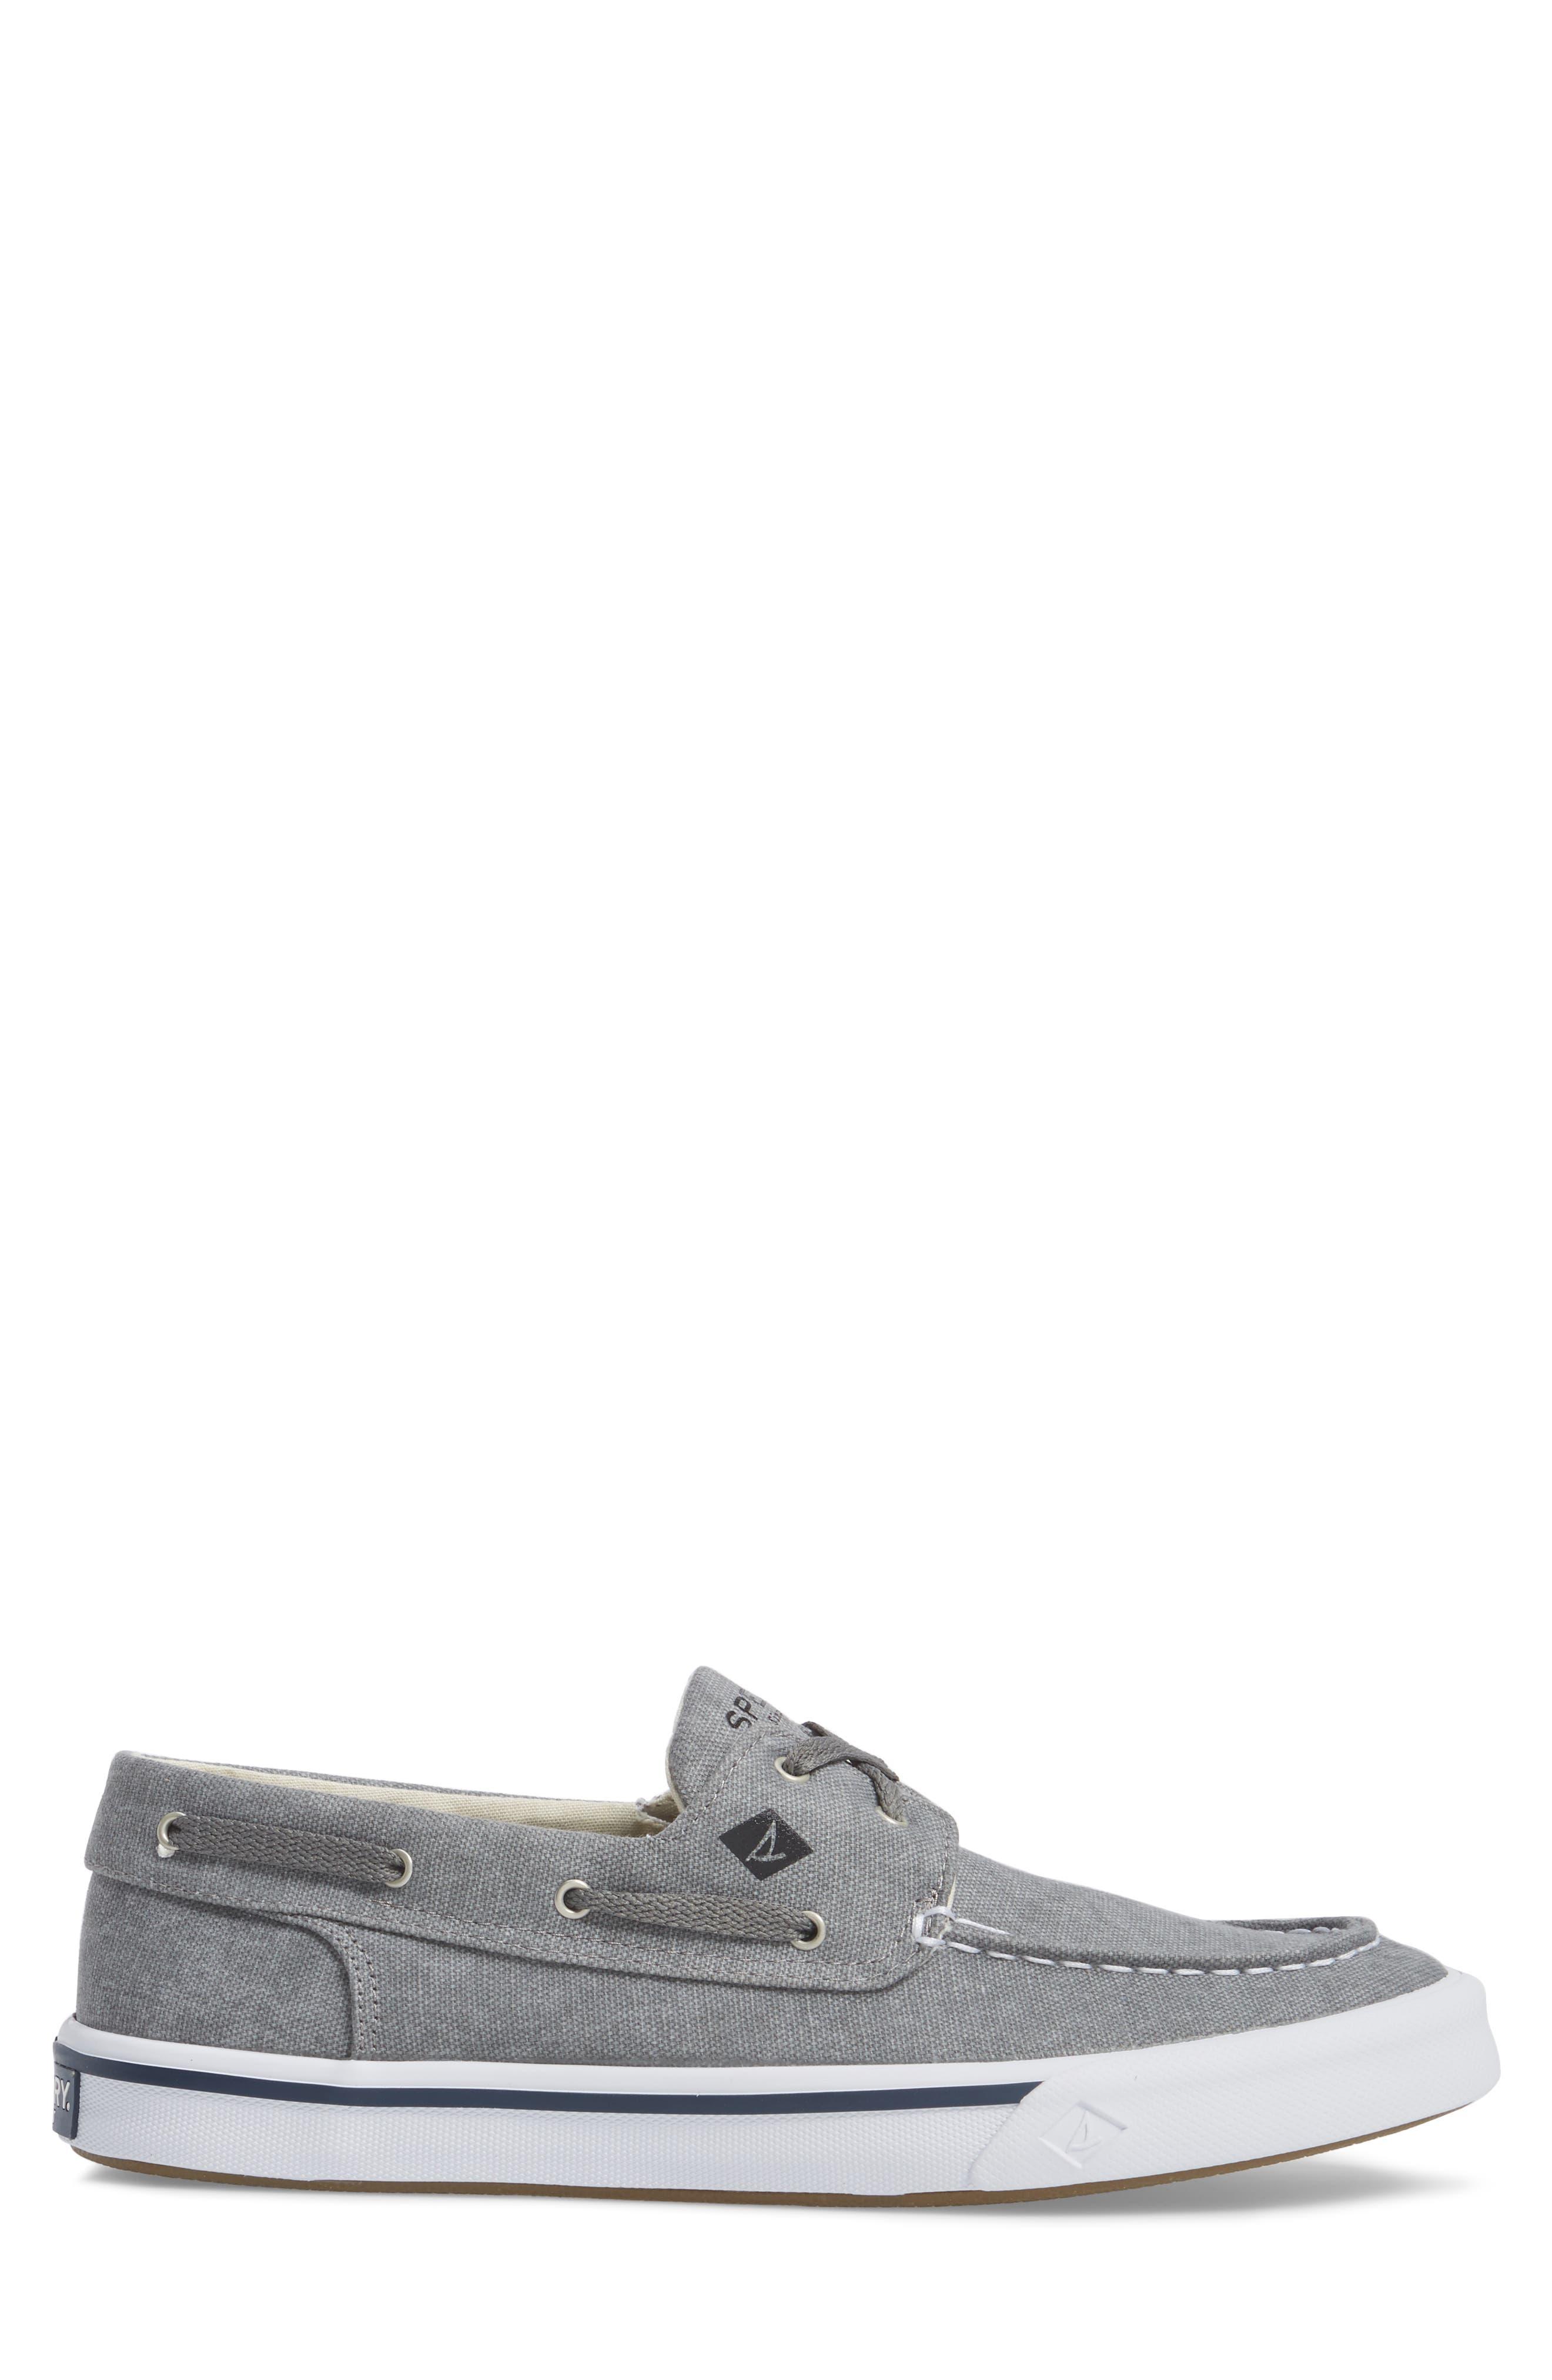 SPERRY, Striper 2 Boat Shoe, Alternate thumbnail 3, color, GREY CANVAS